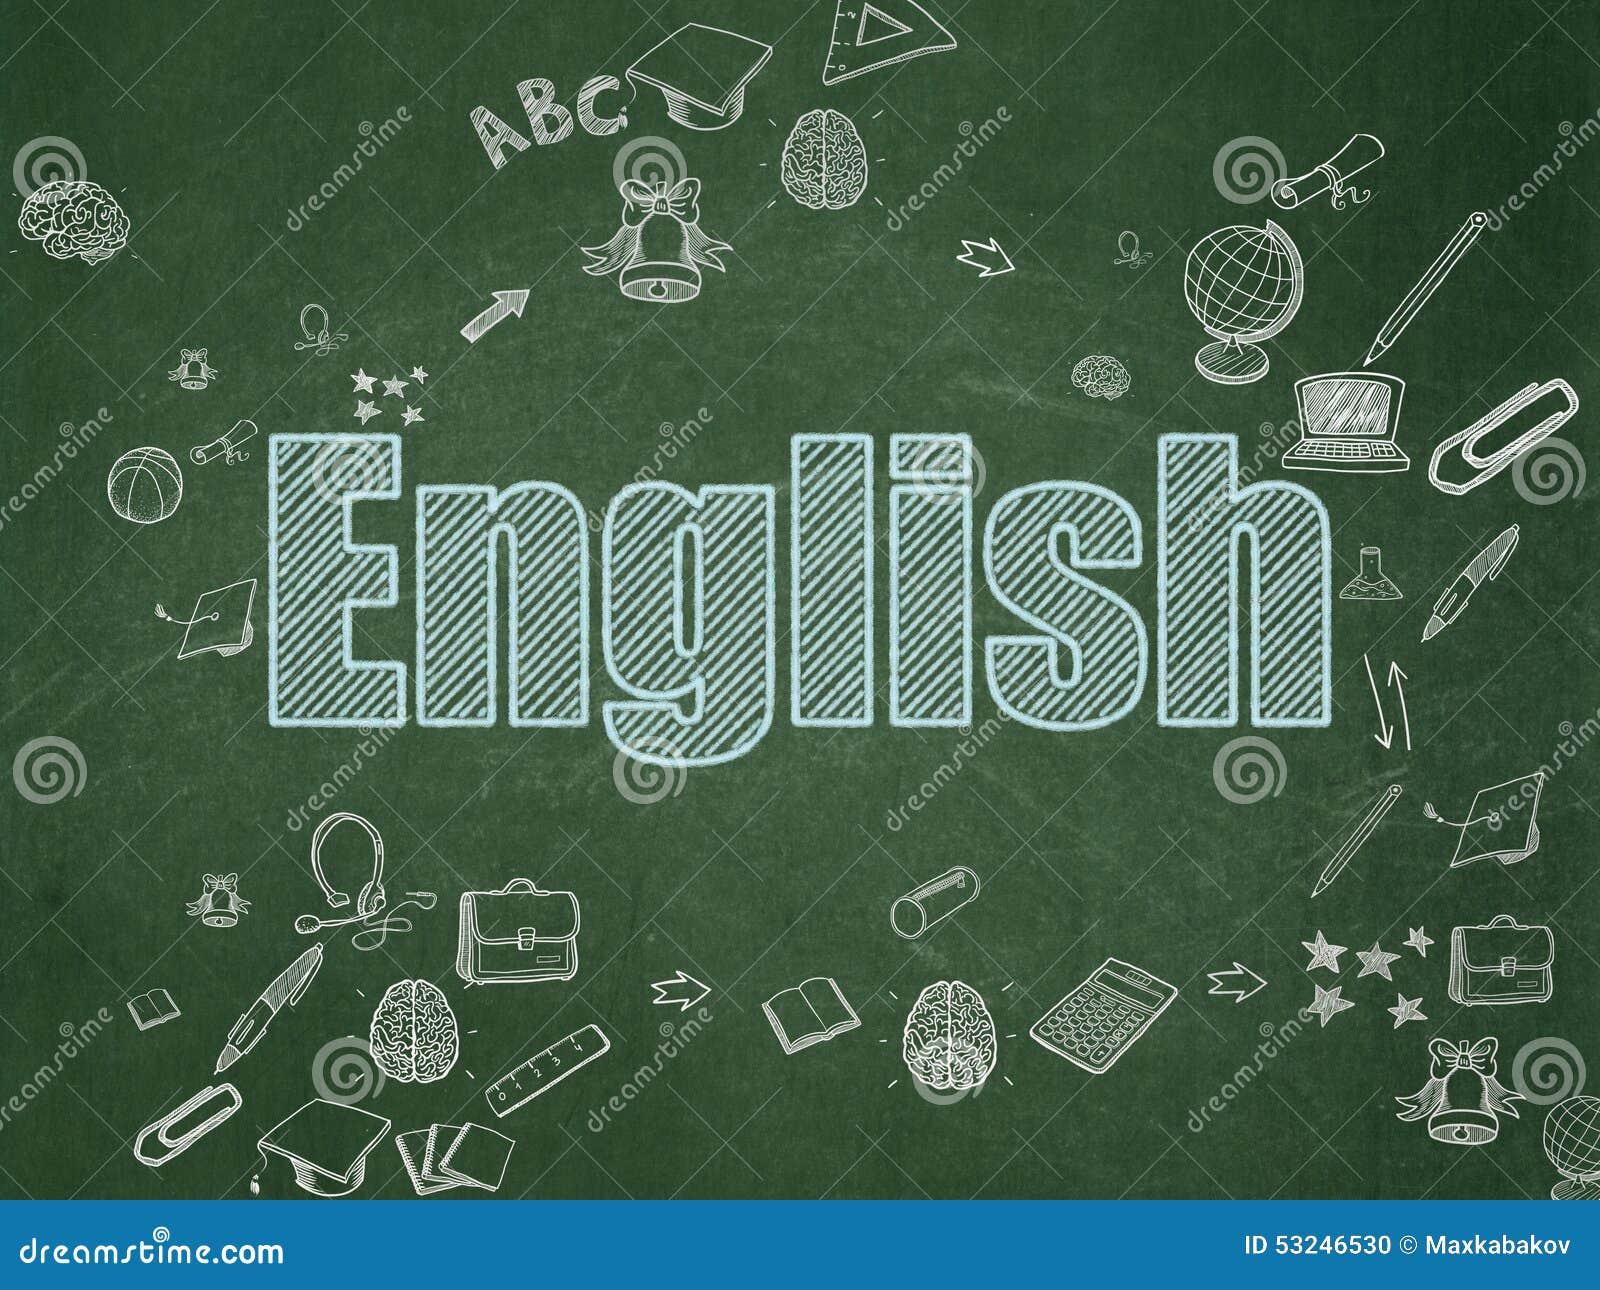 education concept english on school board stock photo teacher clipart images teacher clip art printables